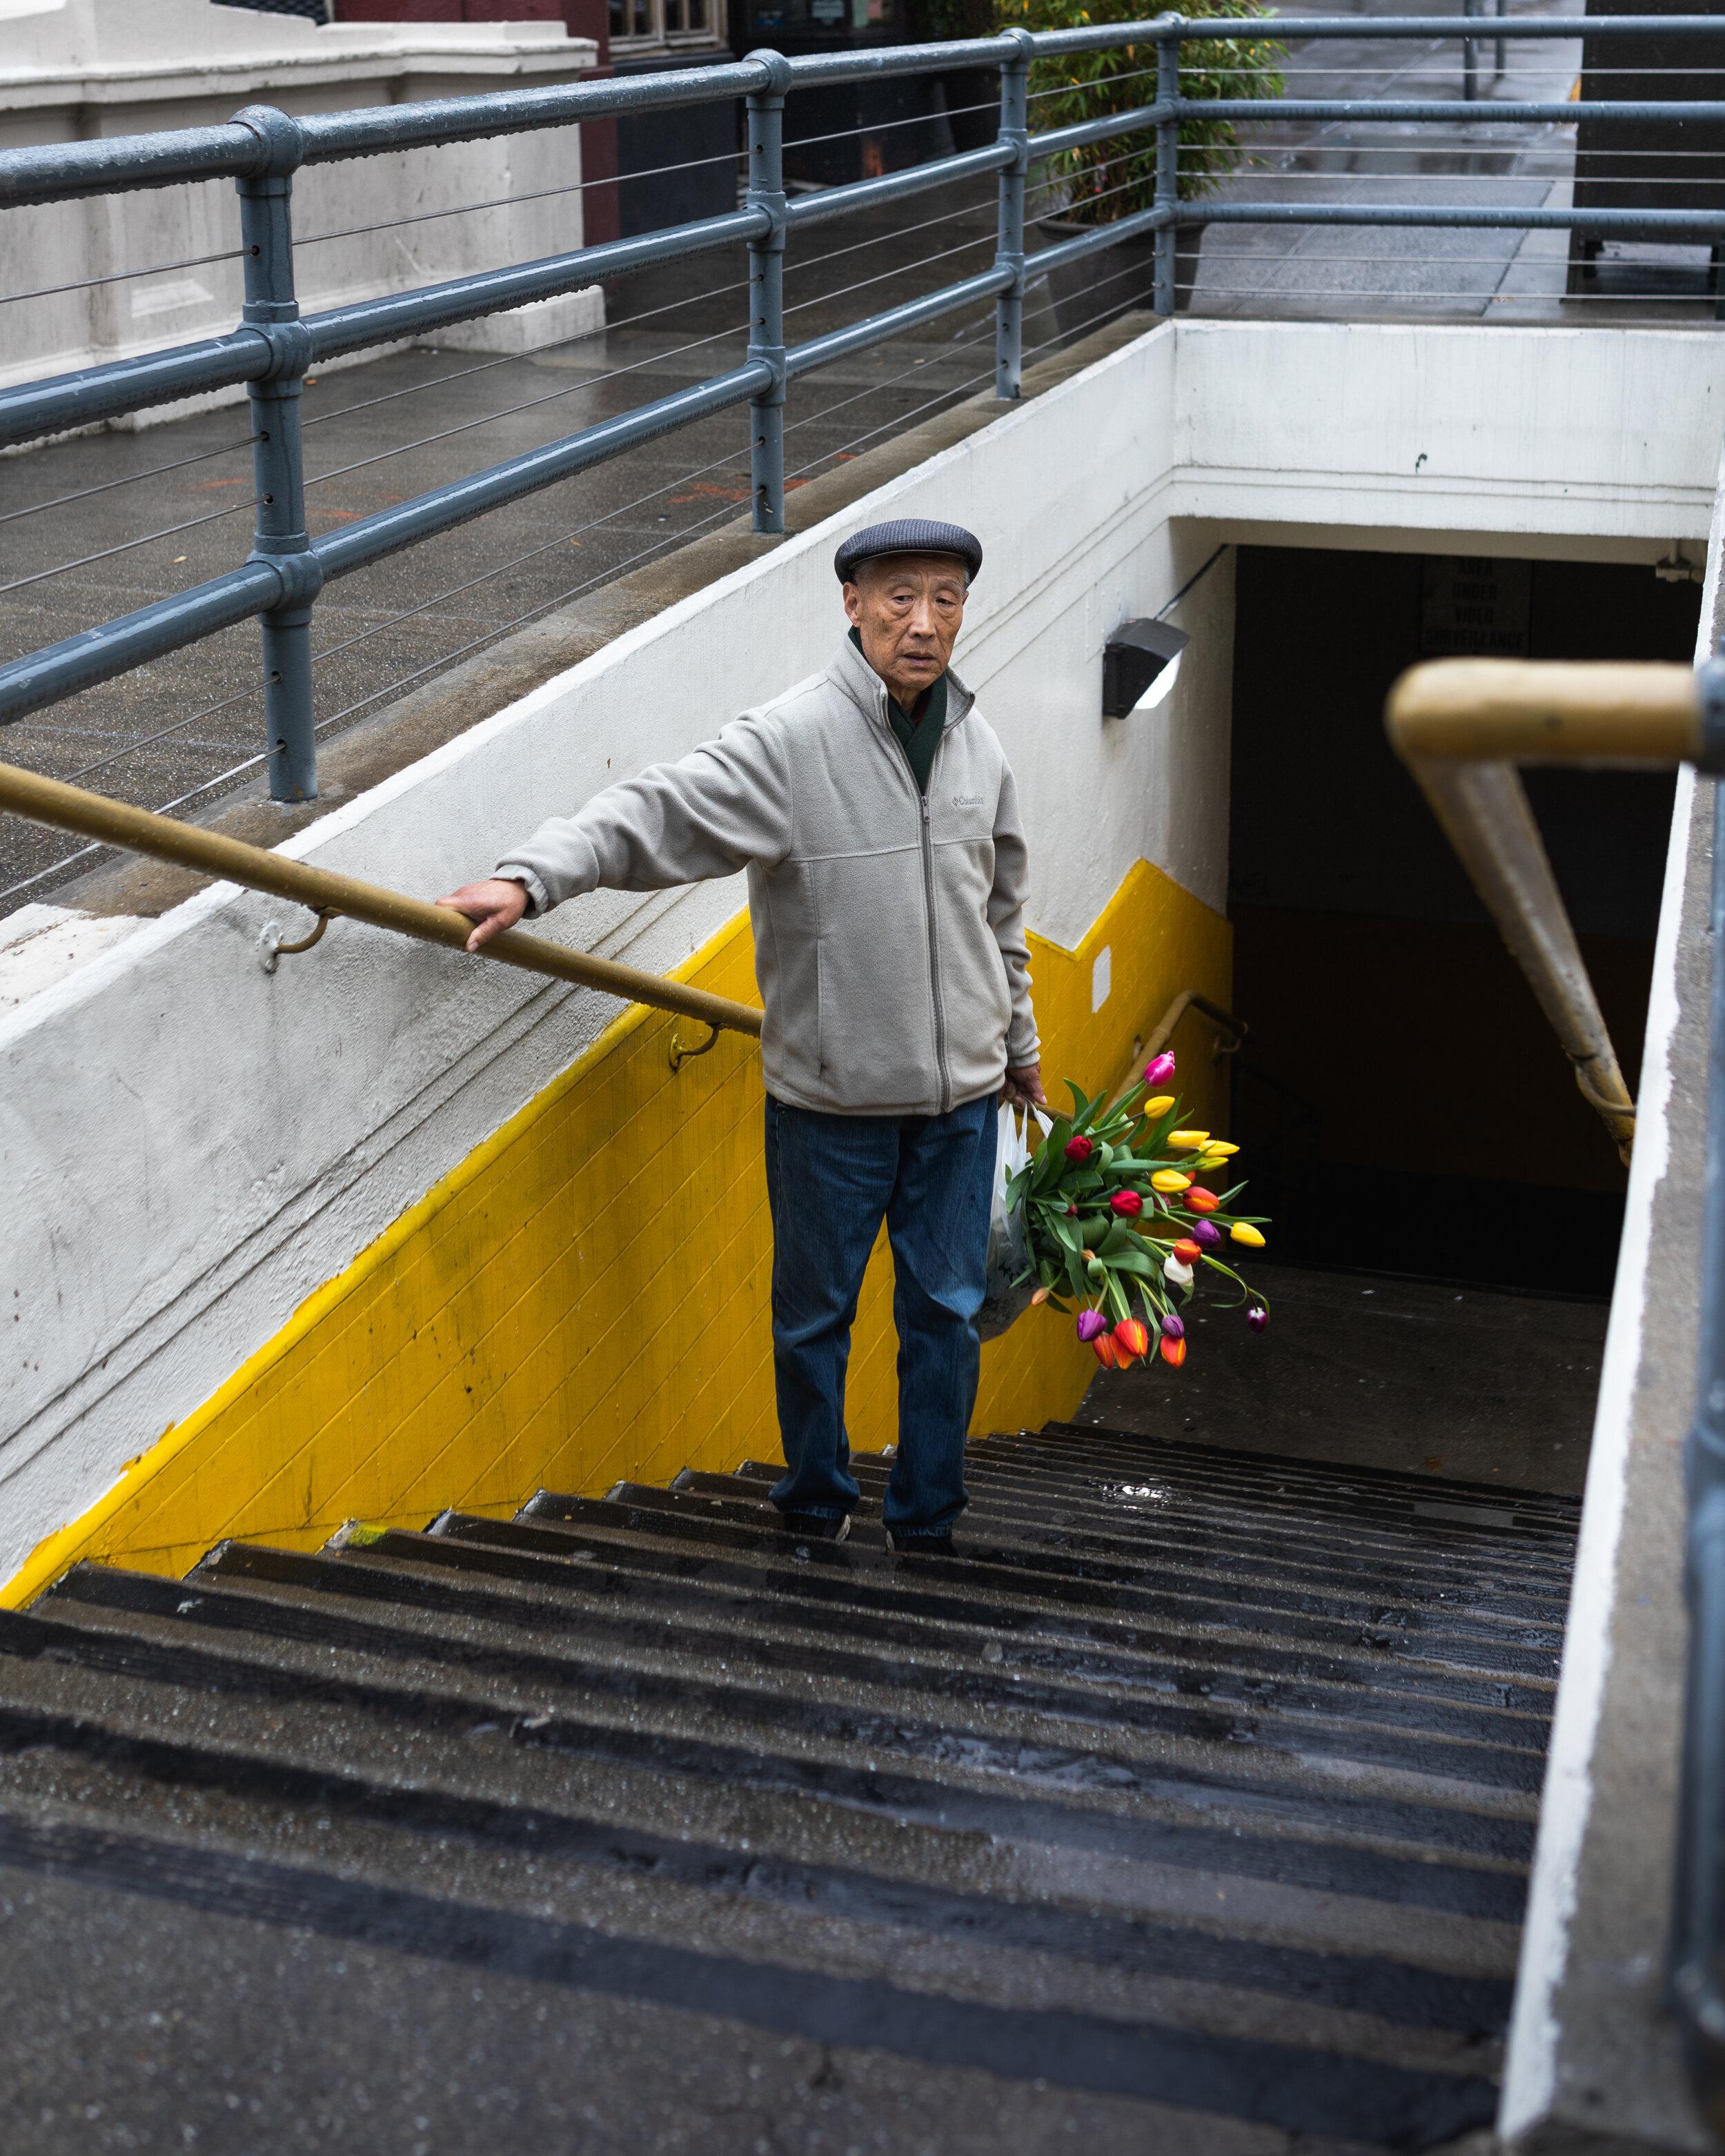 SF Stockton Tunnel Walker with Flowers_.jpg